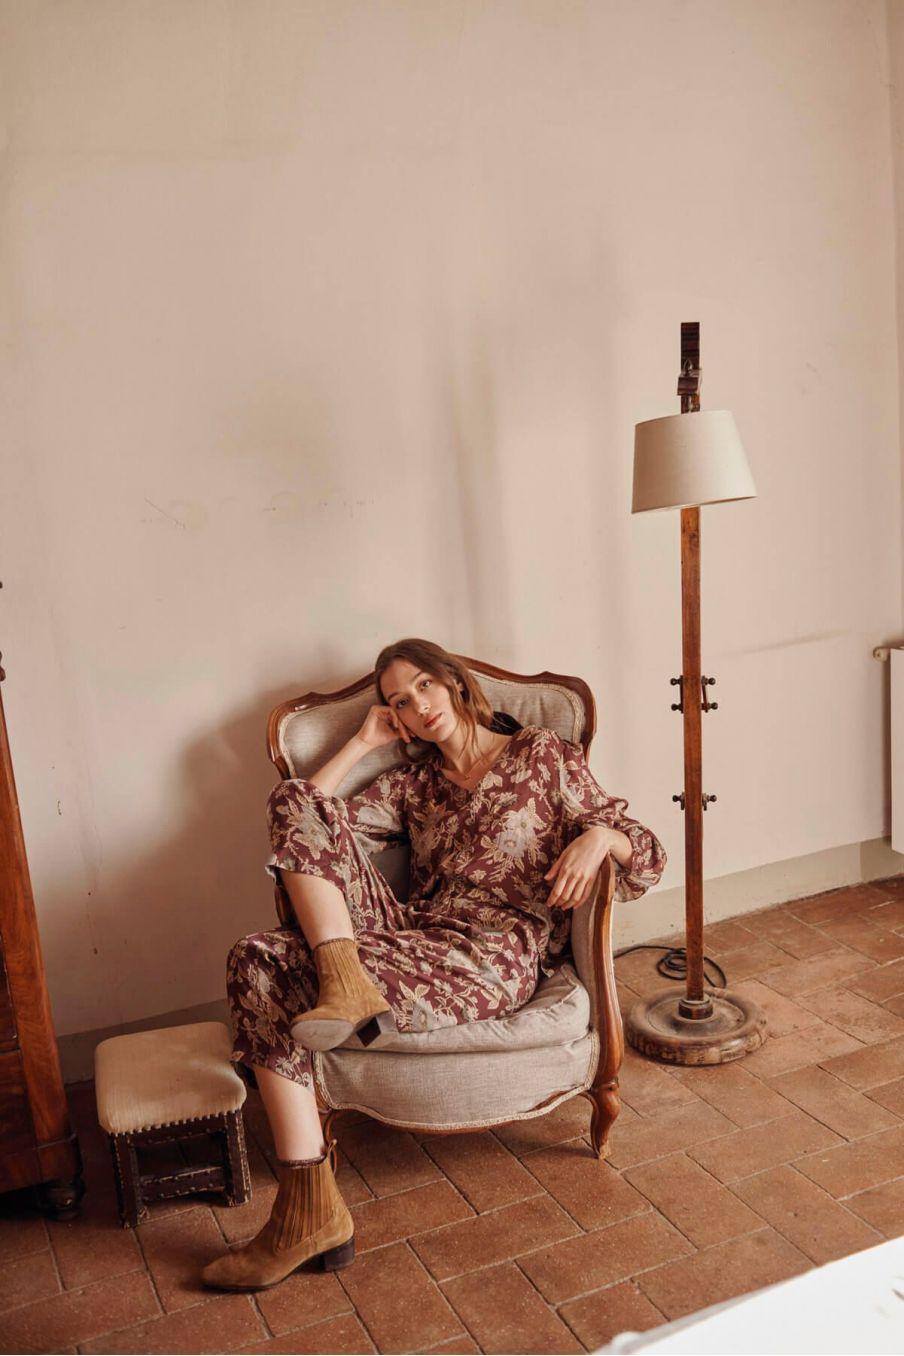 pantalon femme arloew parma passiflora - louise misha